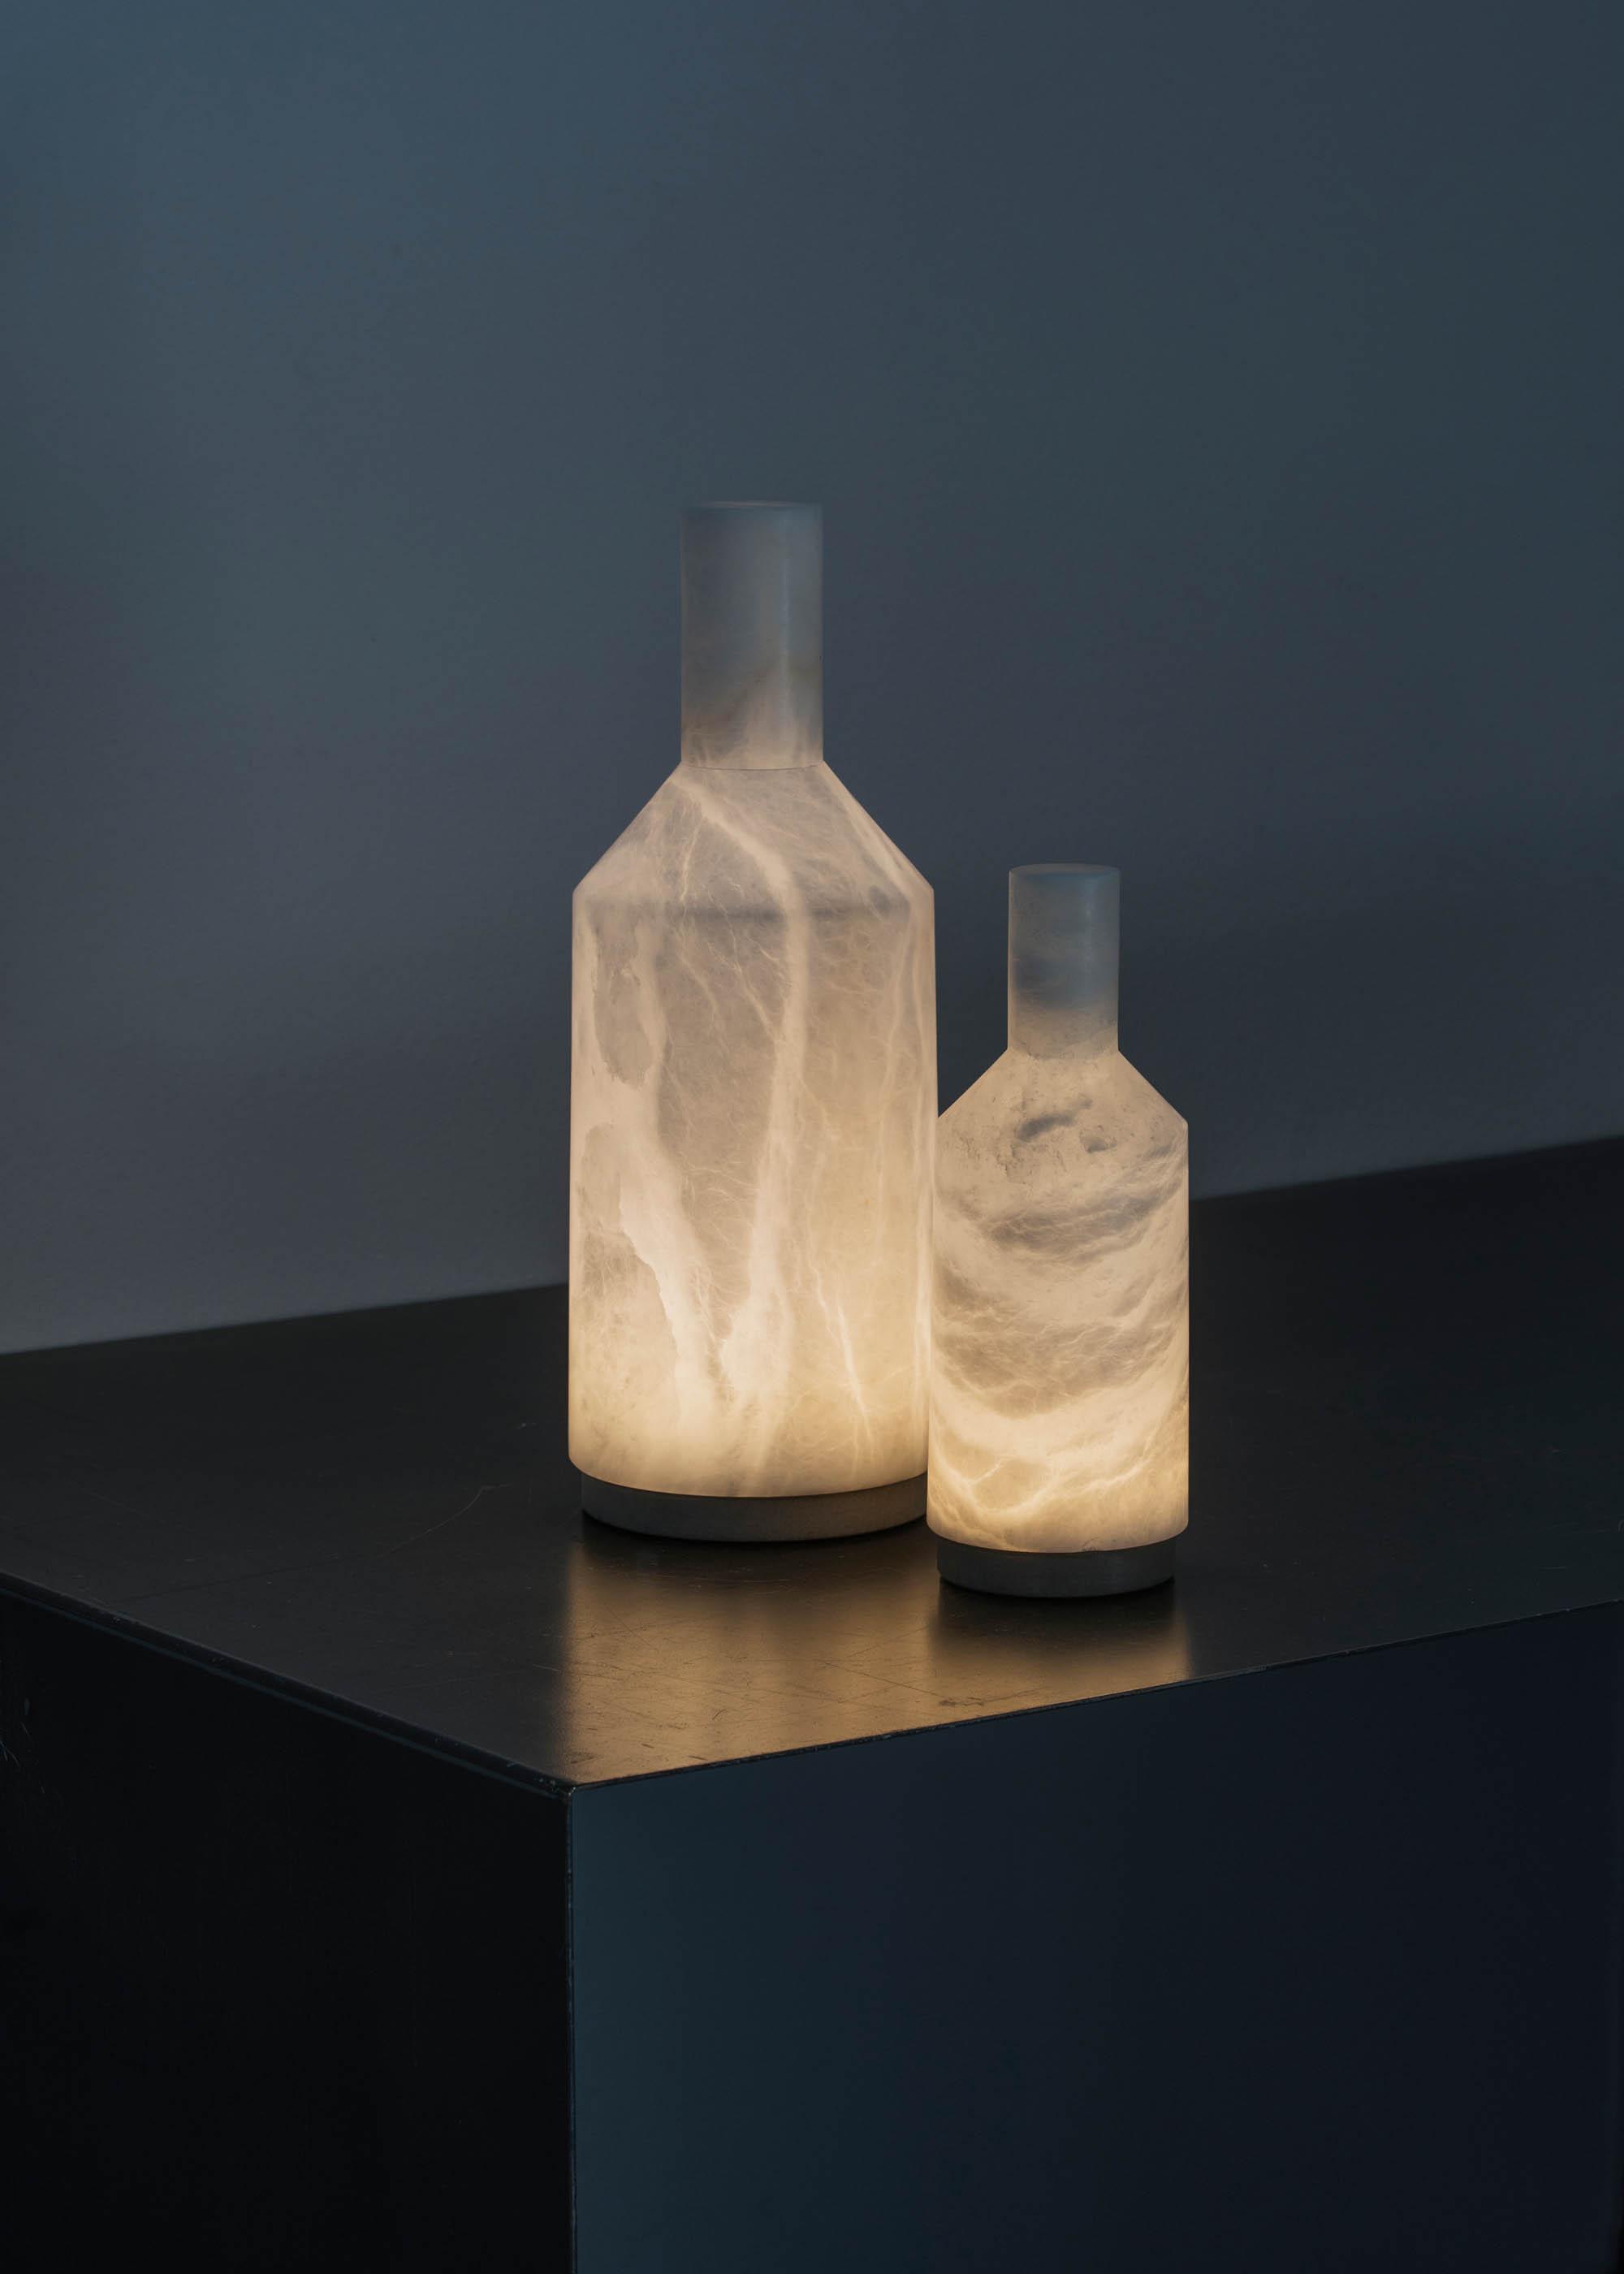 #commissioned #lighting #design #jordiveciana #malvasawada